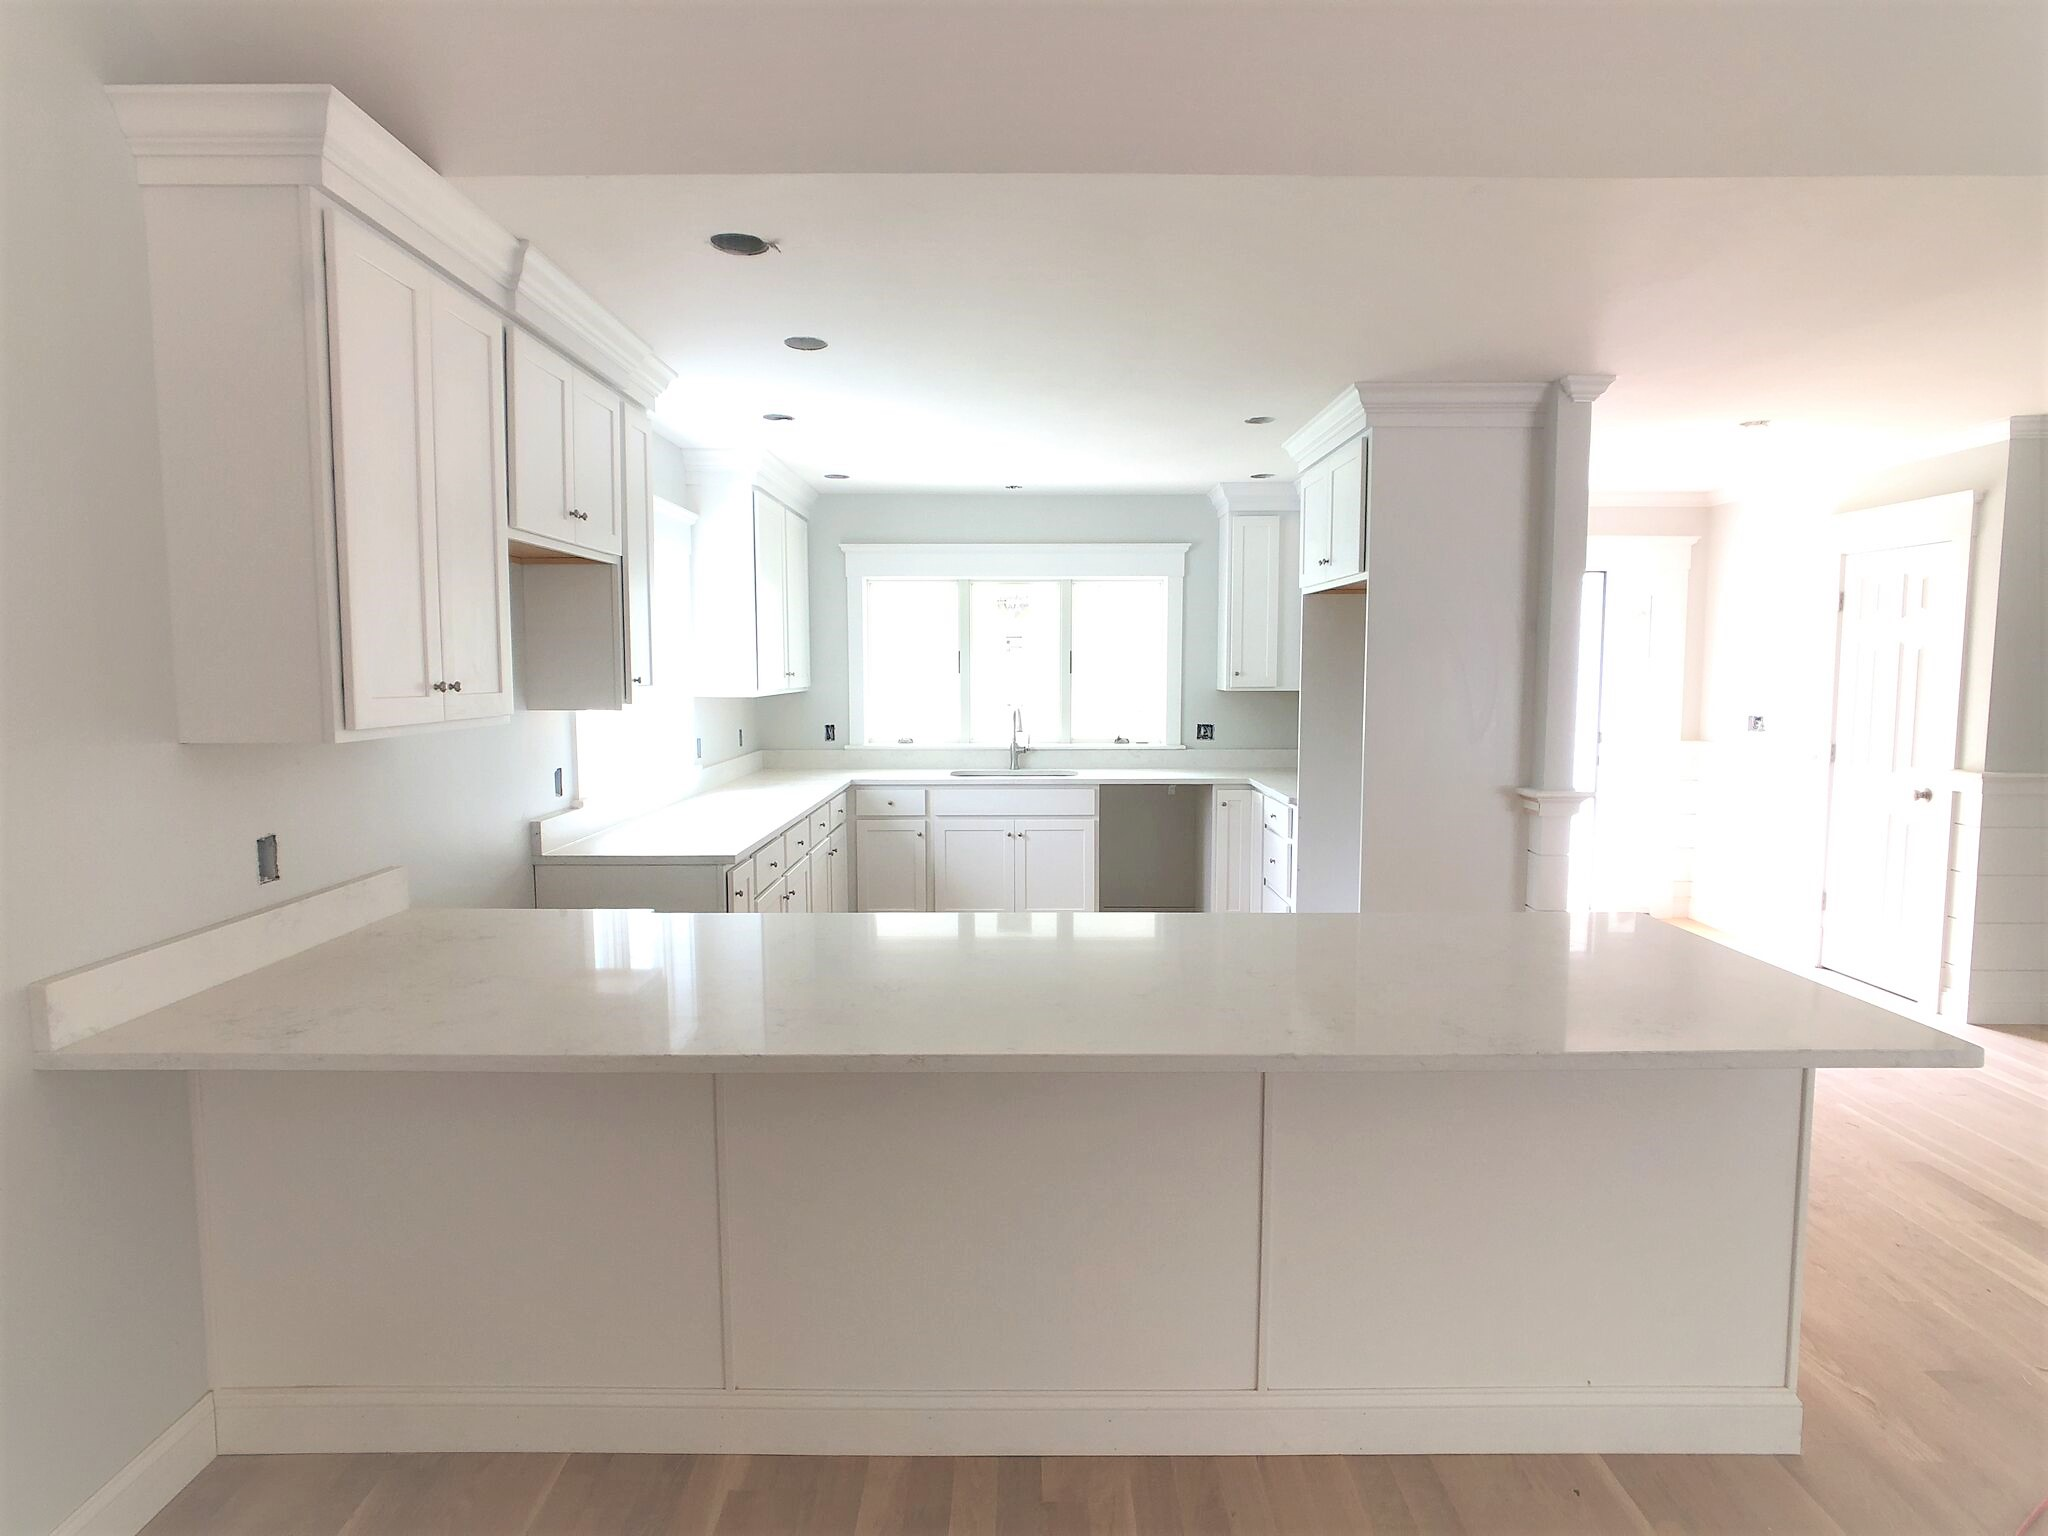 34 cran kitchen.jpeg